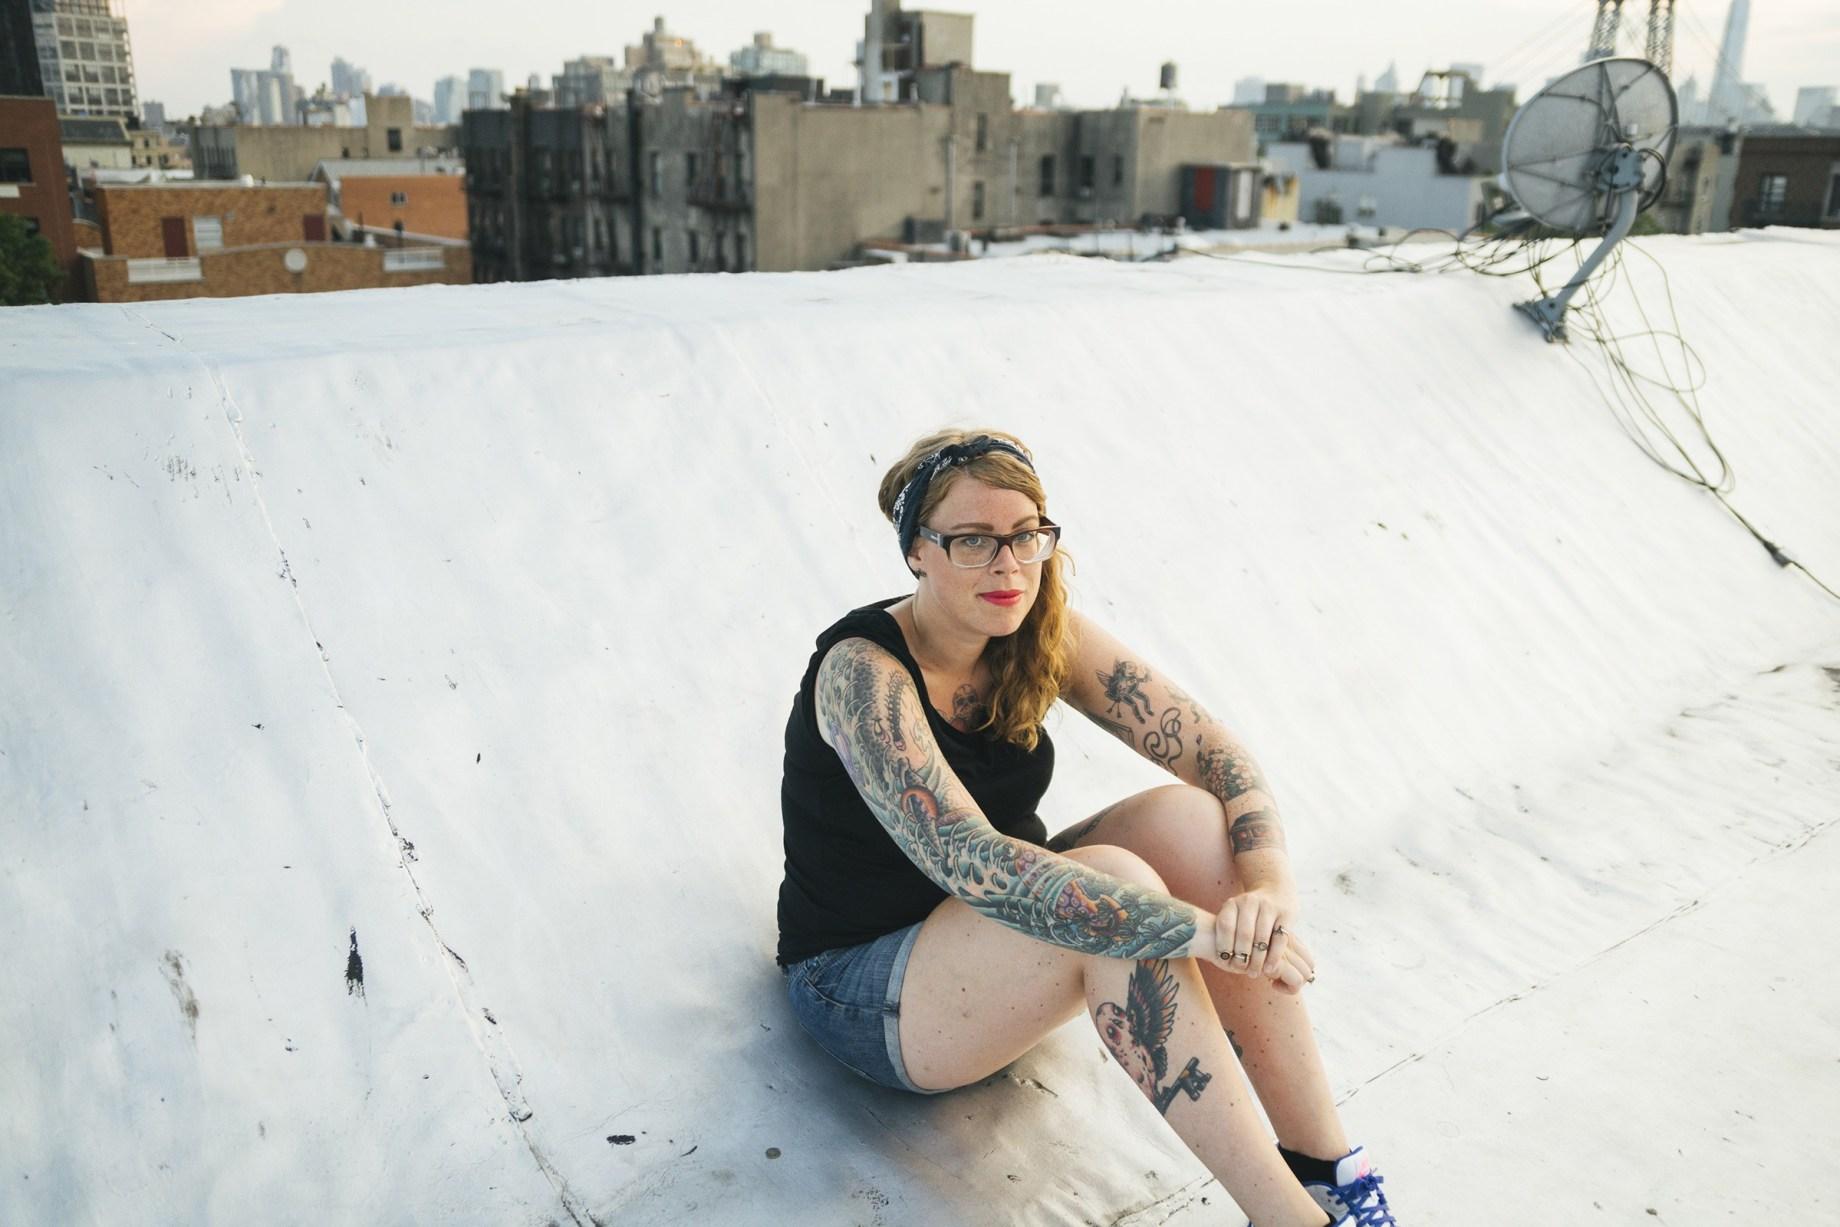 Emma-Pettersson-K-Composite-Magazine-3